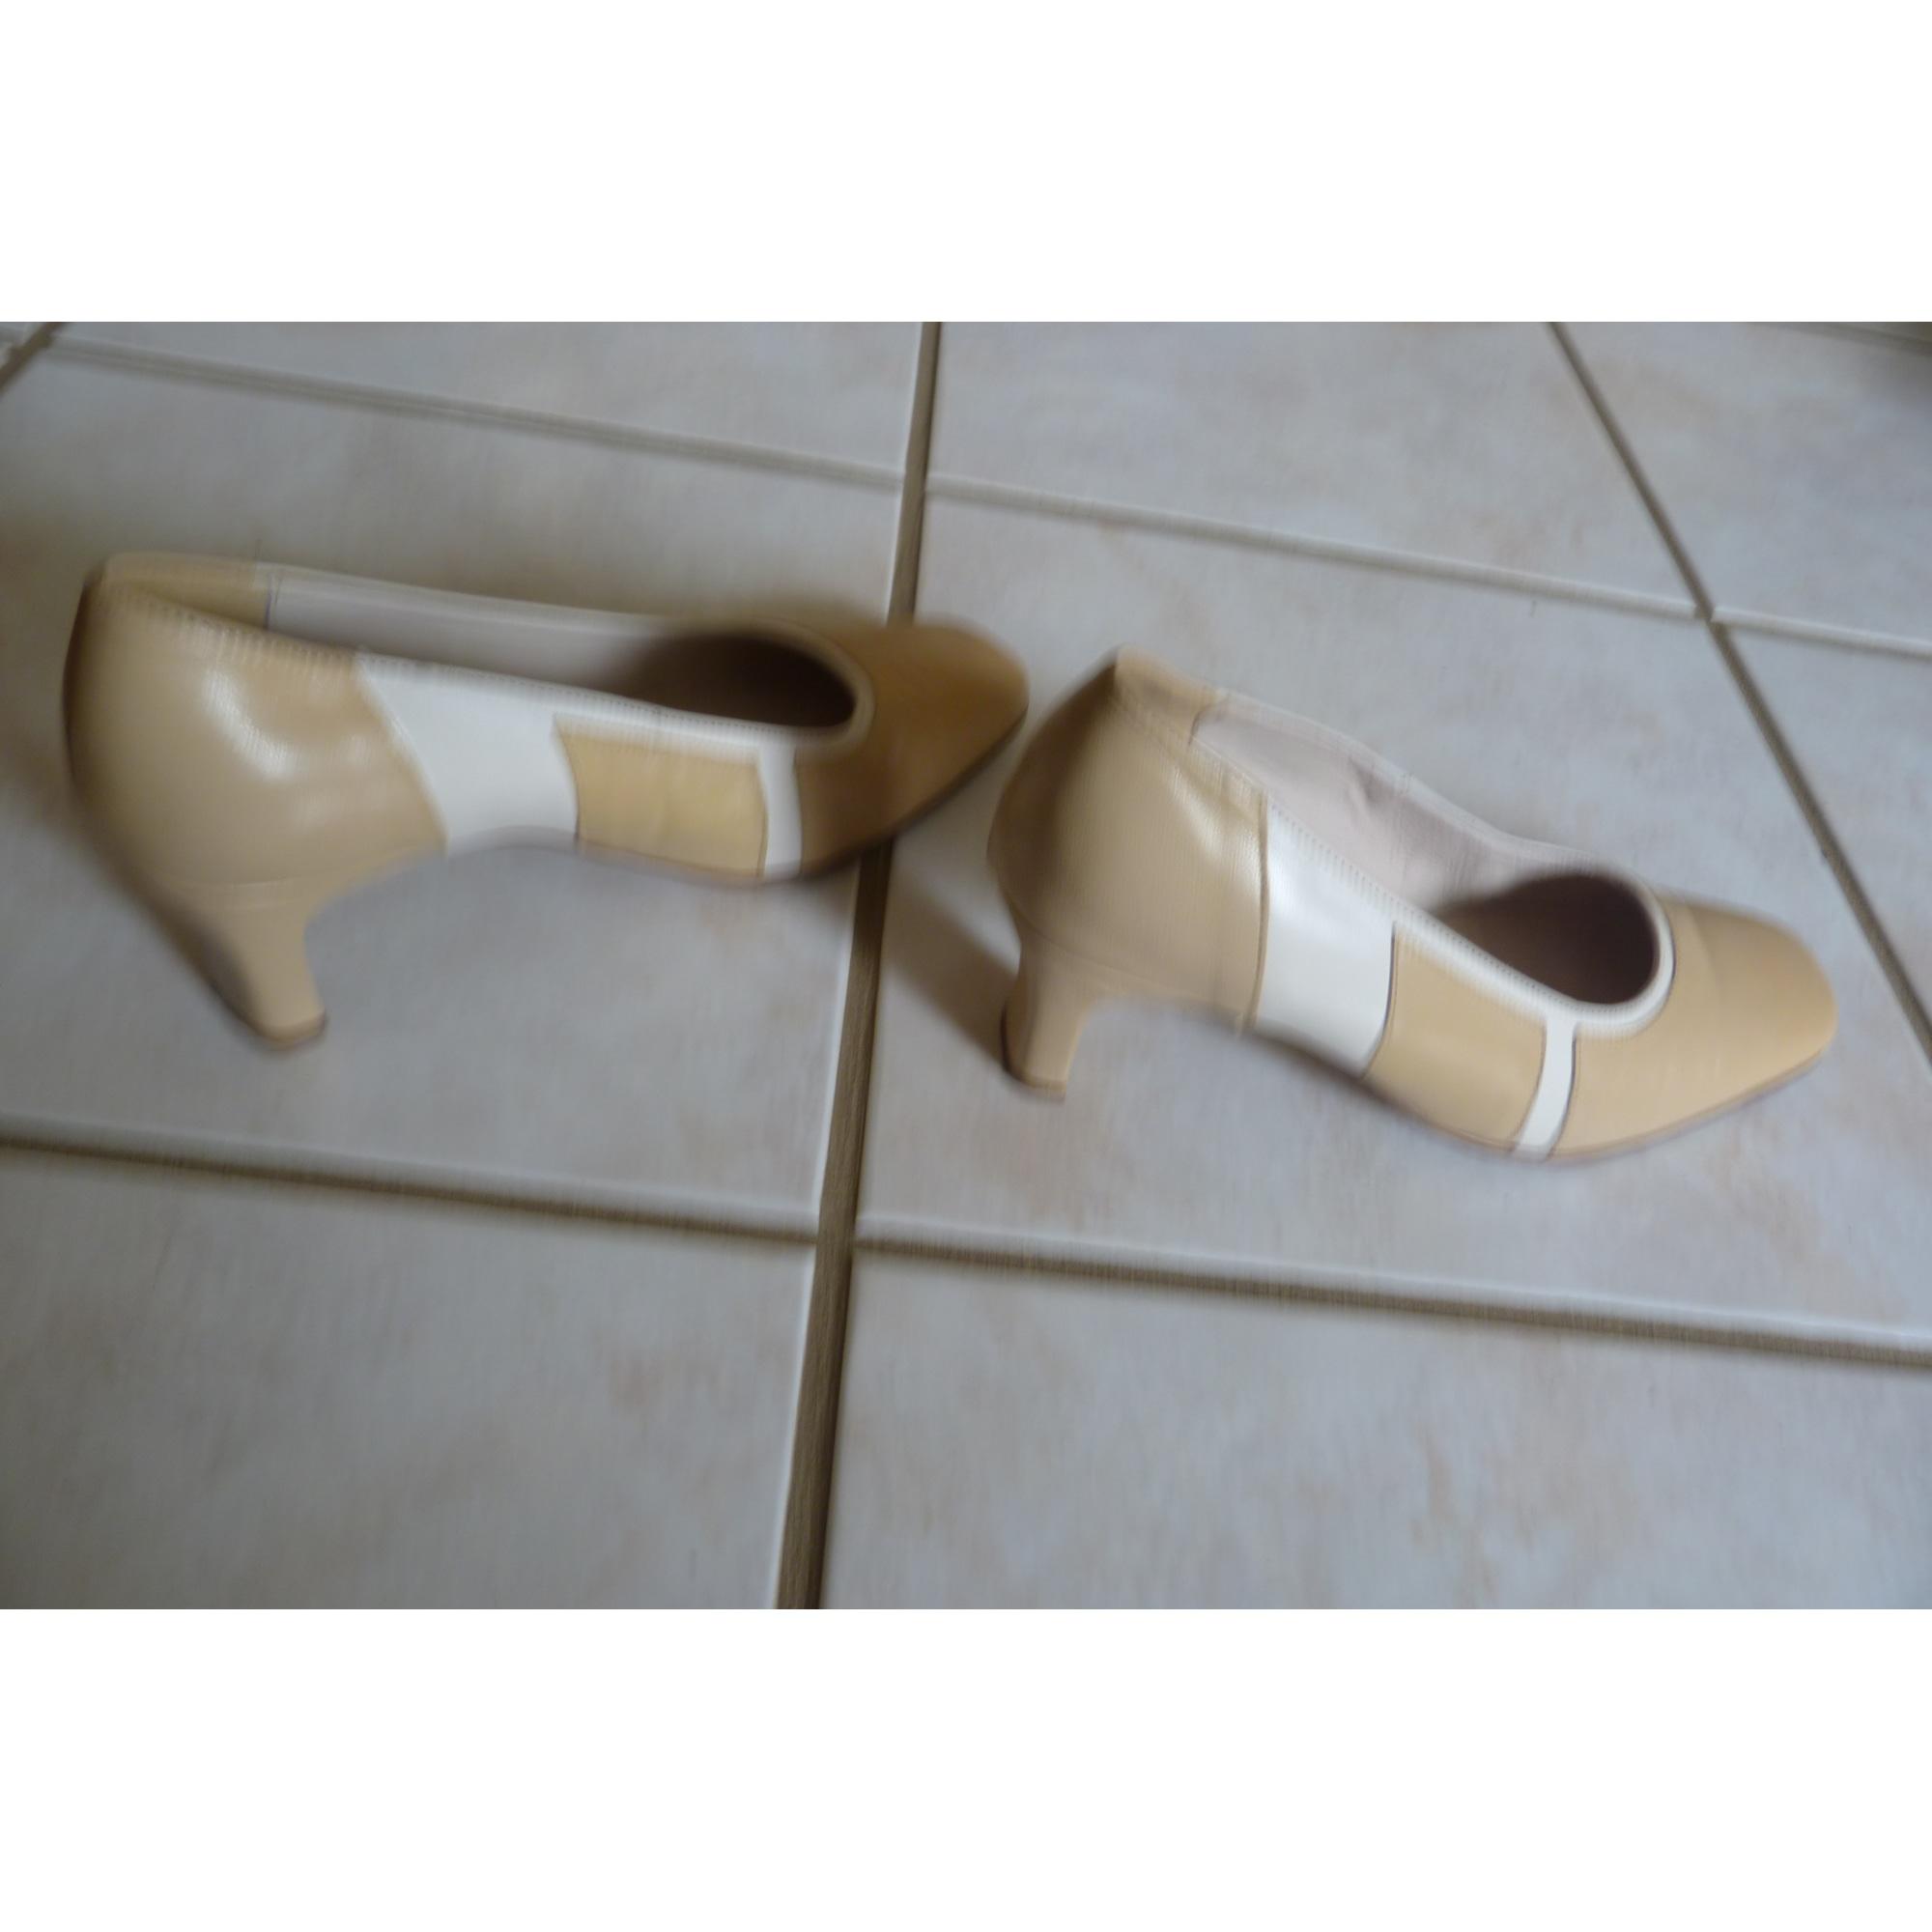 talon chaussure femme talon predilection remplacer chaussure femme remplacer 34AqR5jcLS